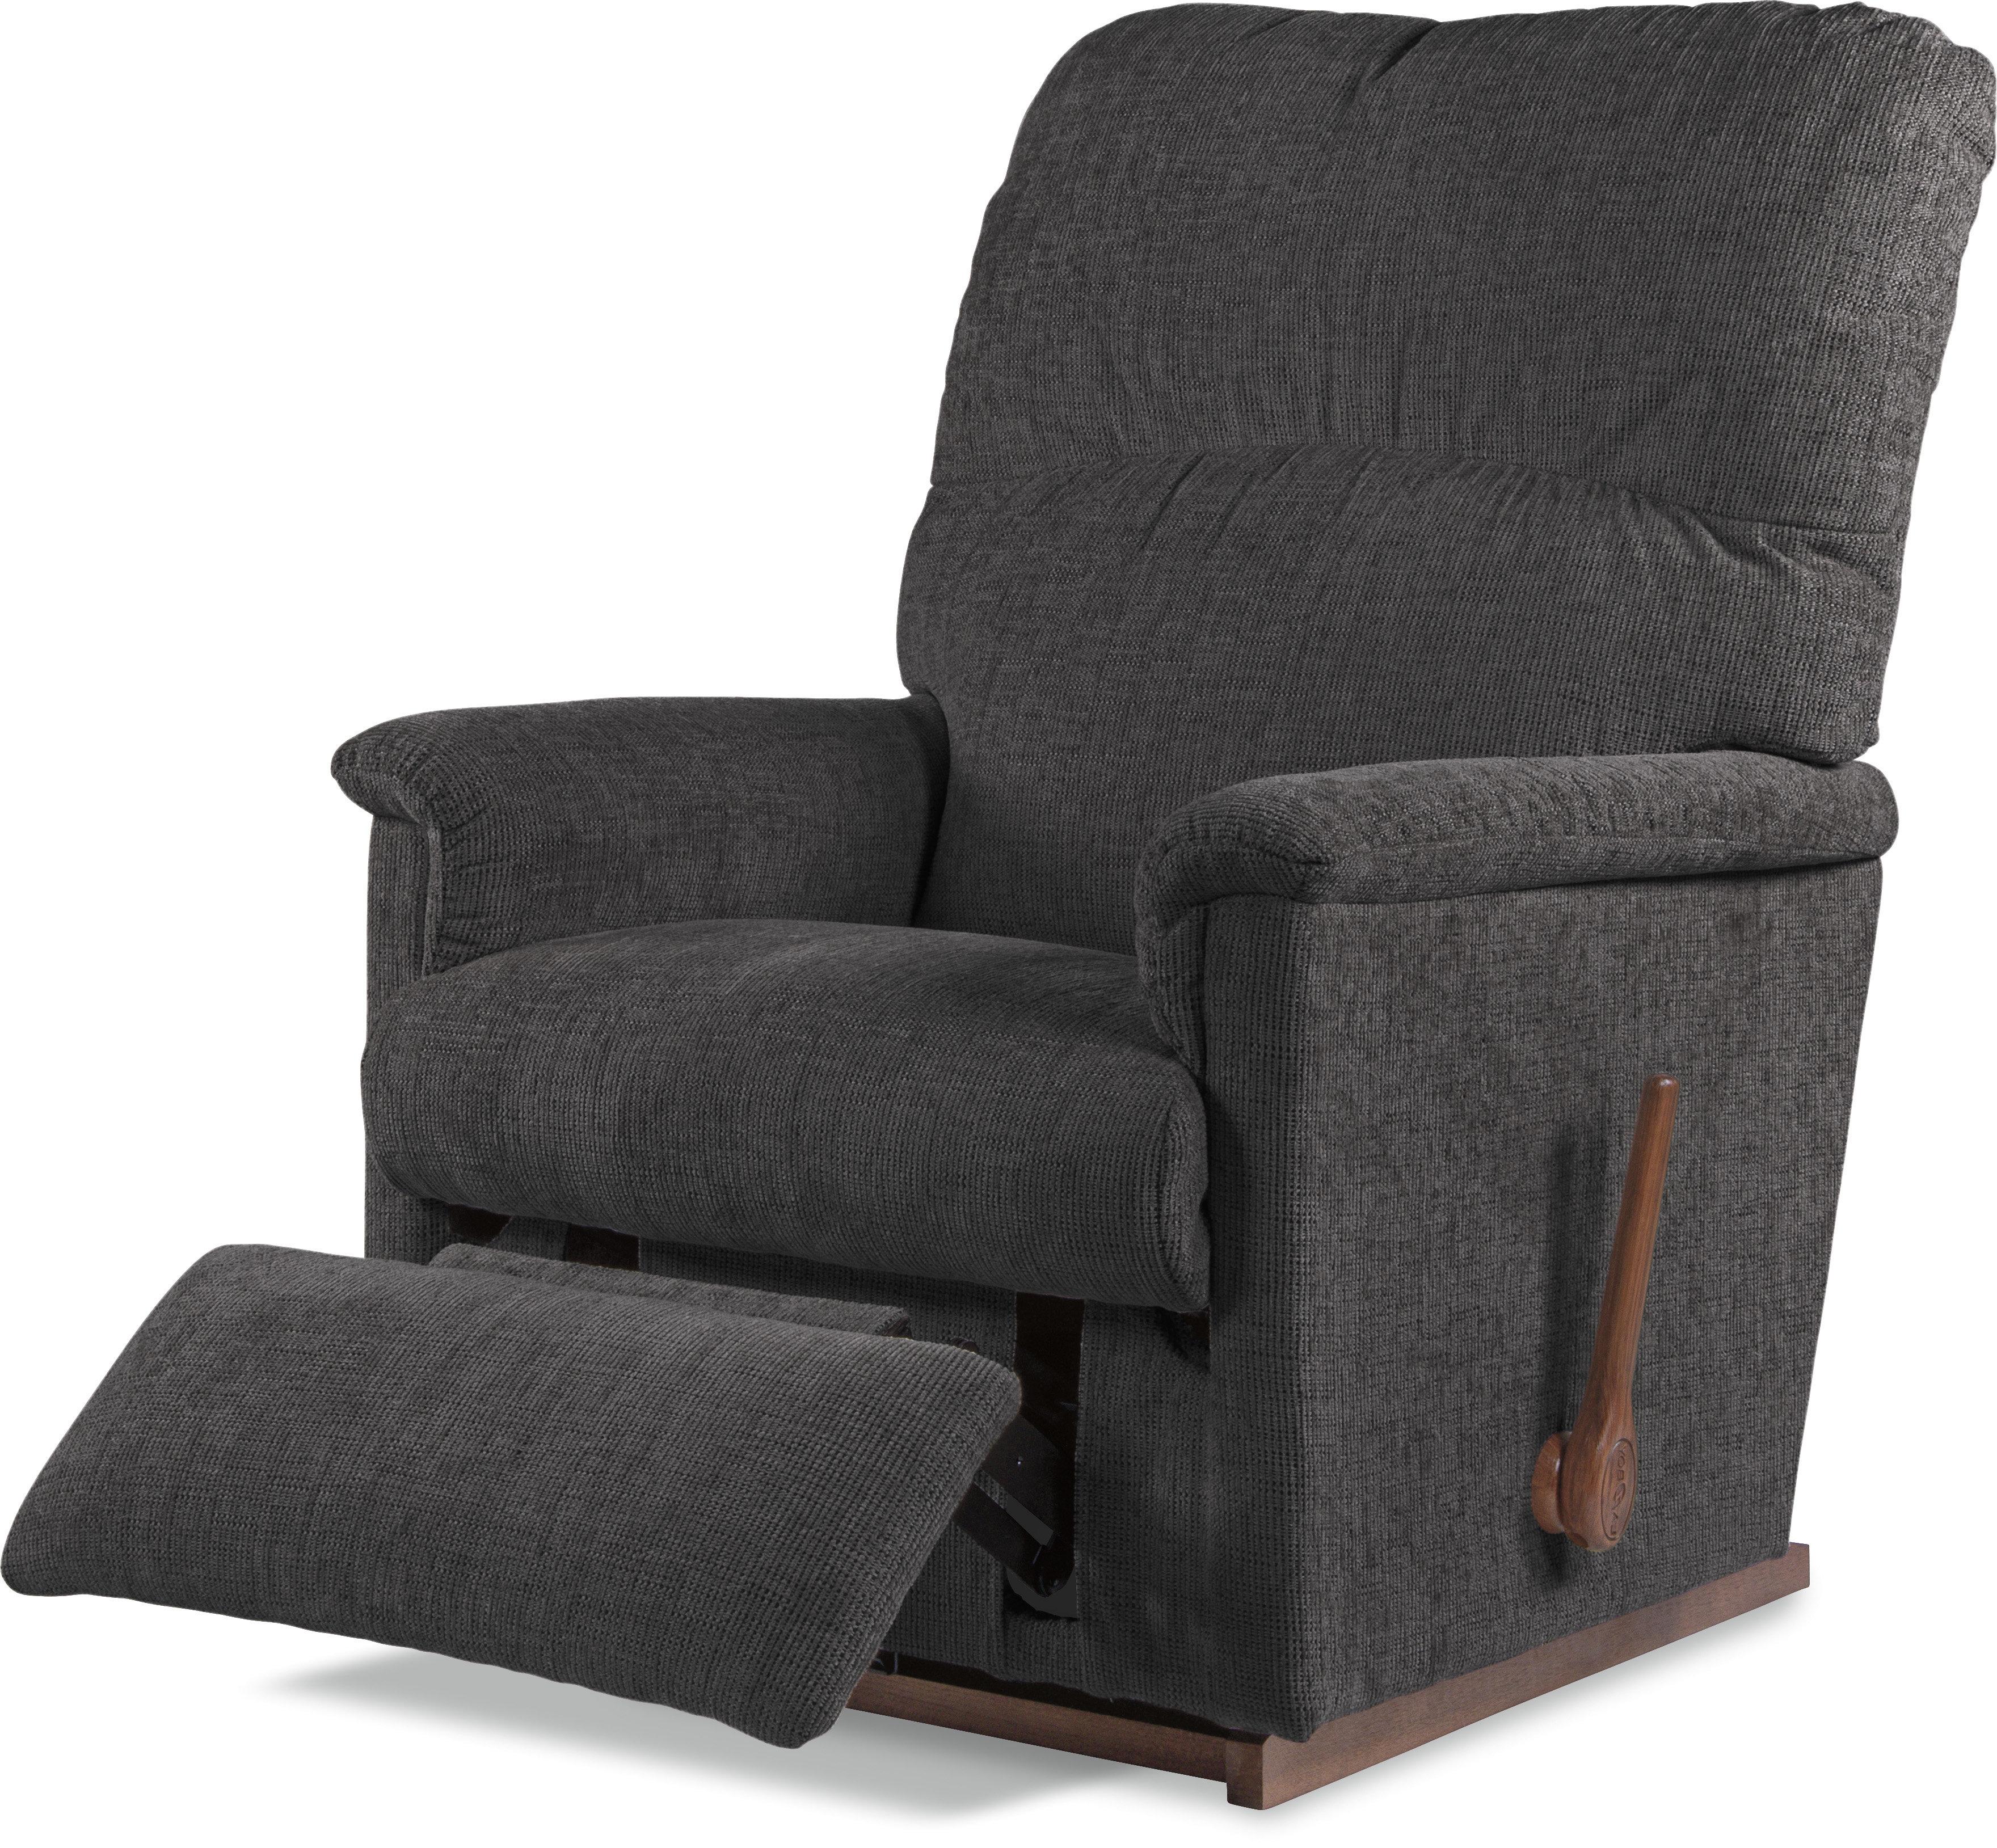 Wayfair Within Sheldon Oversized Sofa Chairs (View 7 of 20)